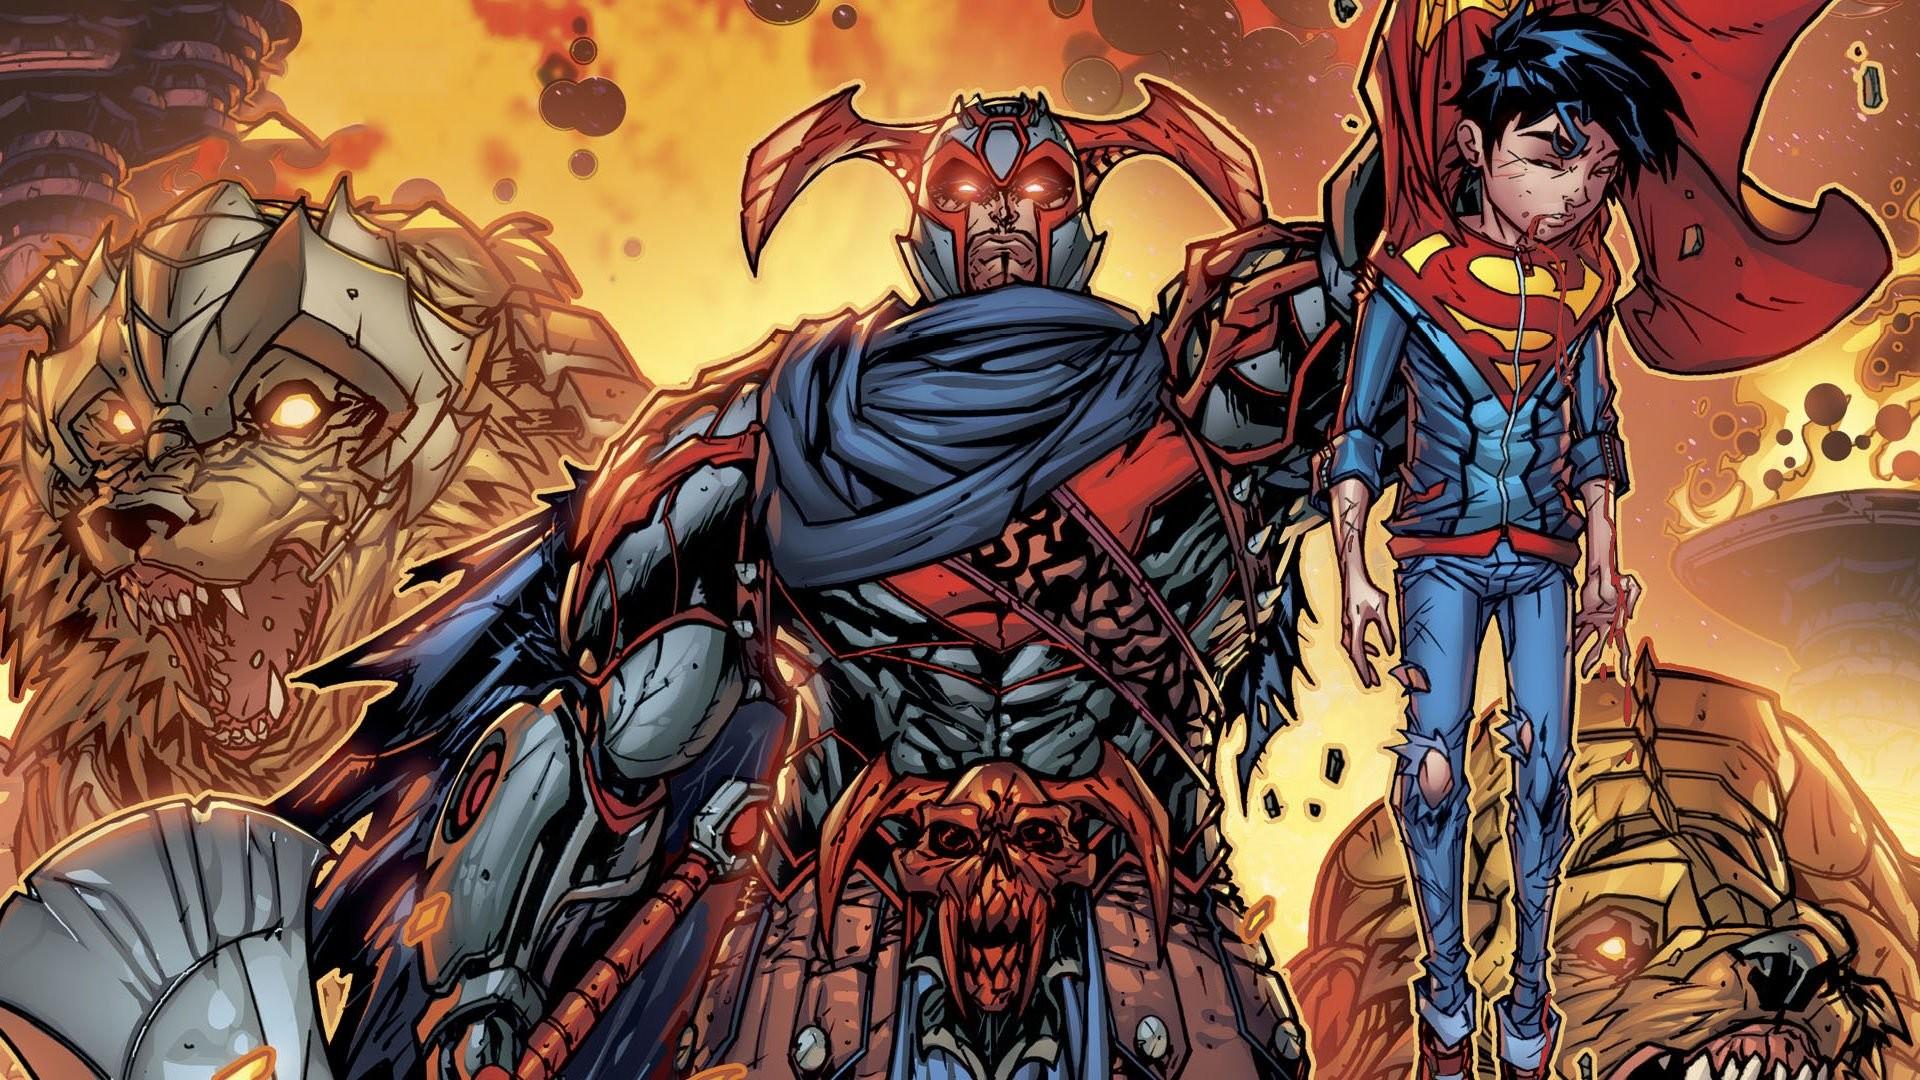 Res: 1920x1080, Comics - Steppenwolf Superman DC Comics Gerechtigkeitsliga Superboy  Wallpaper